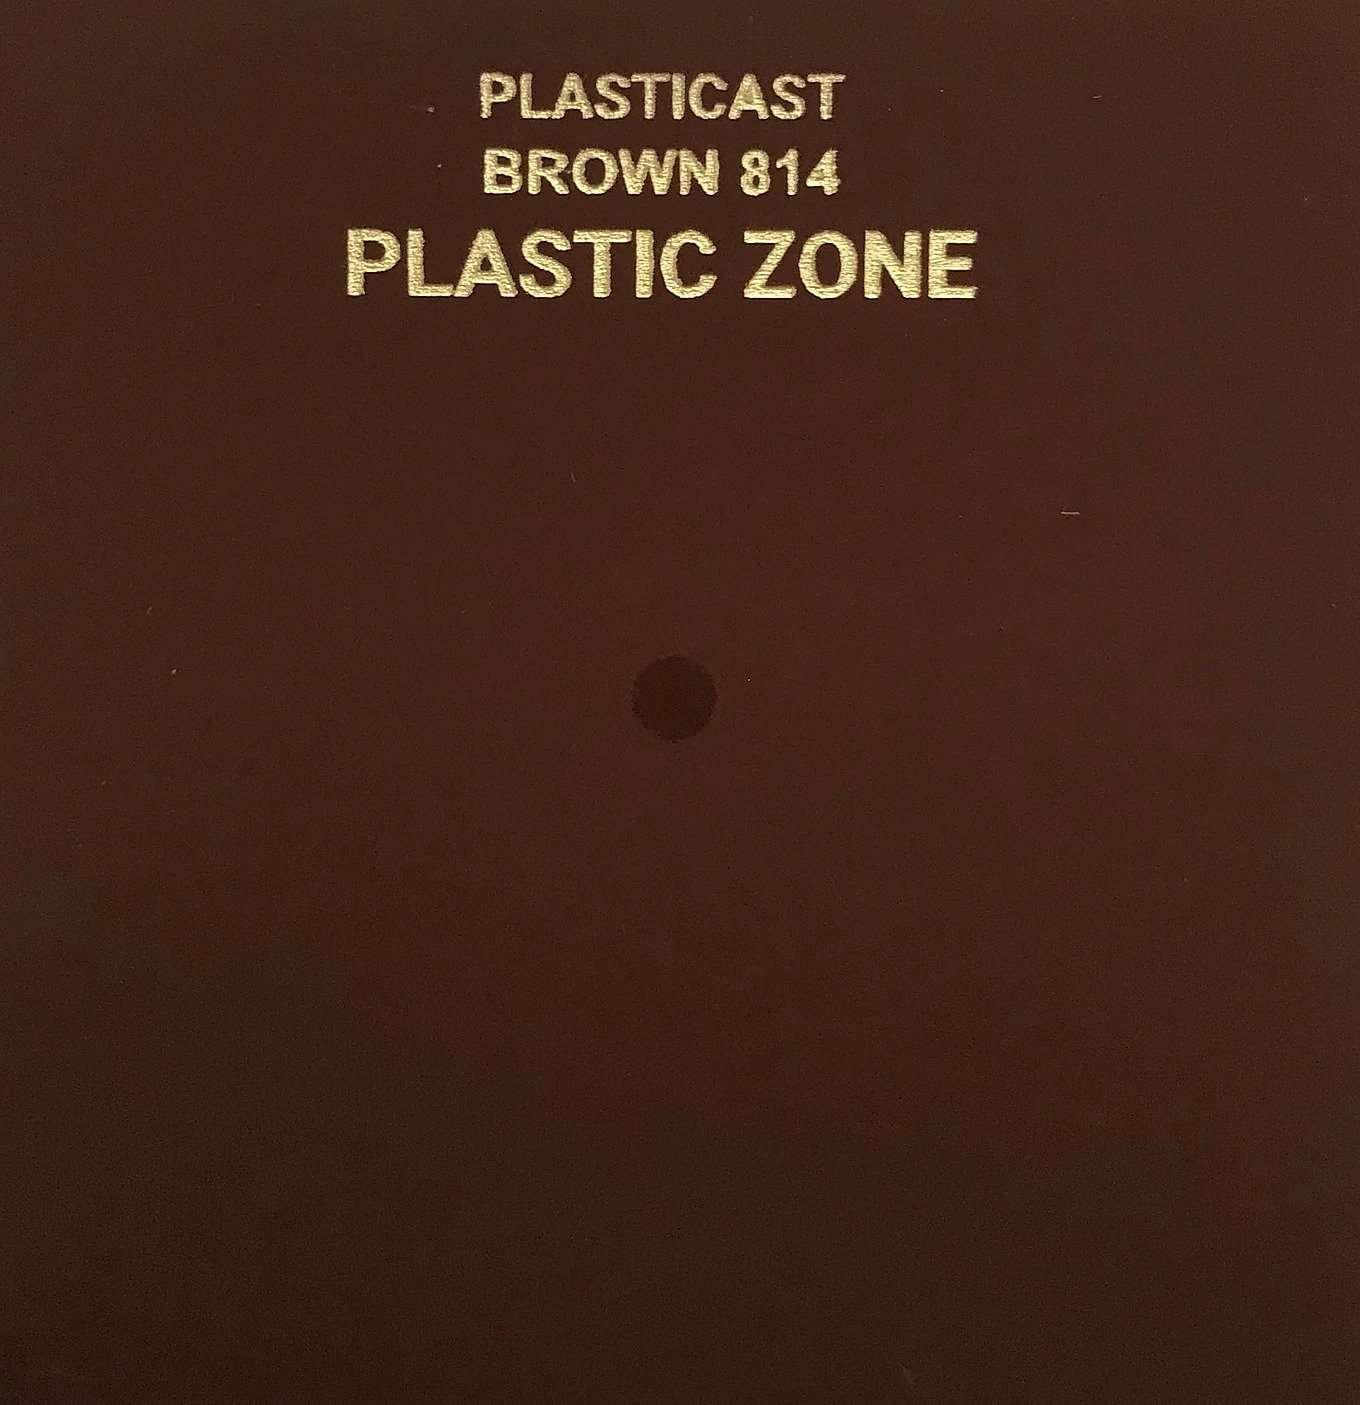 Brown 814 acrylic sheet